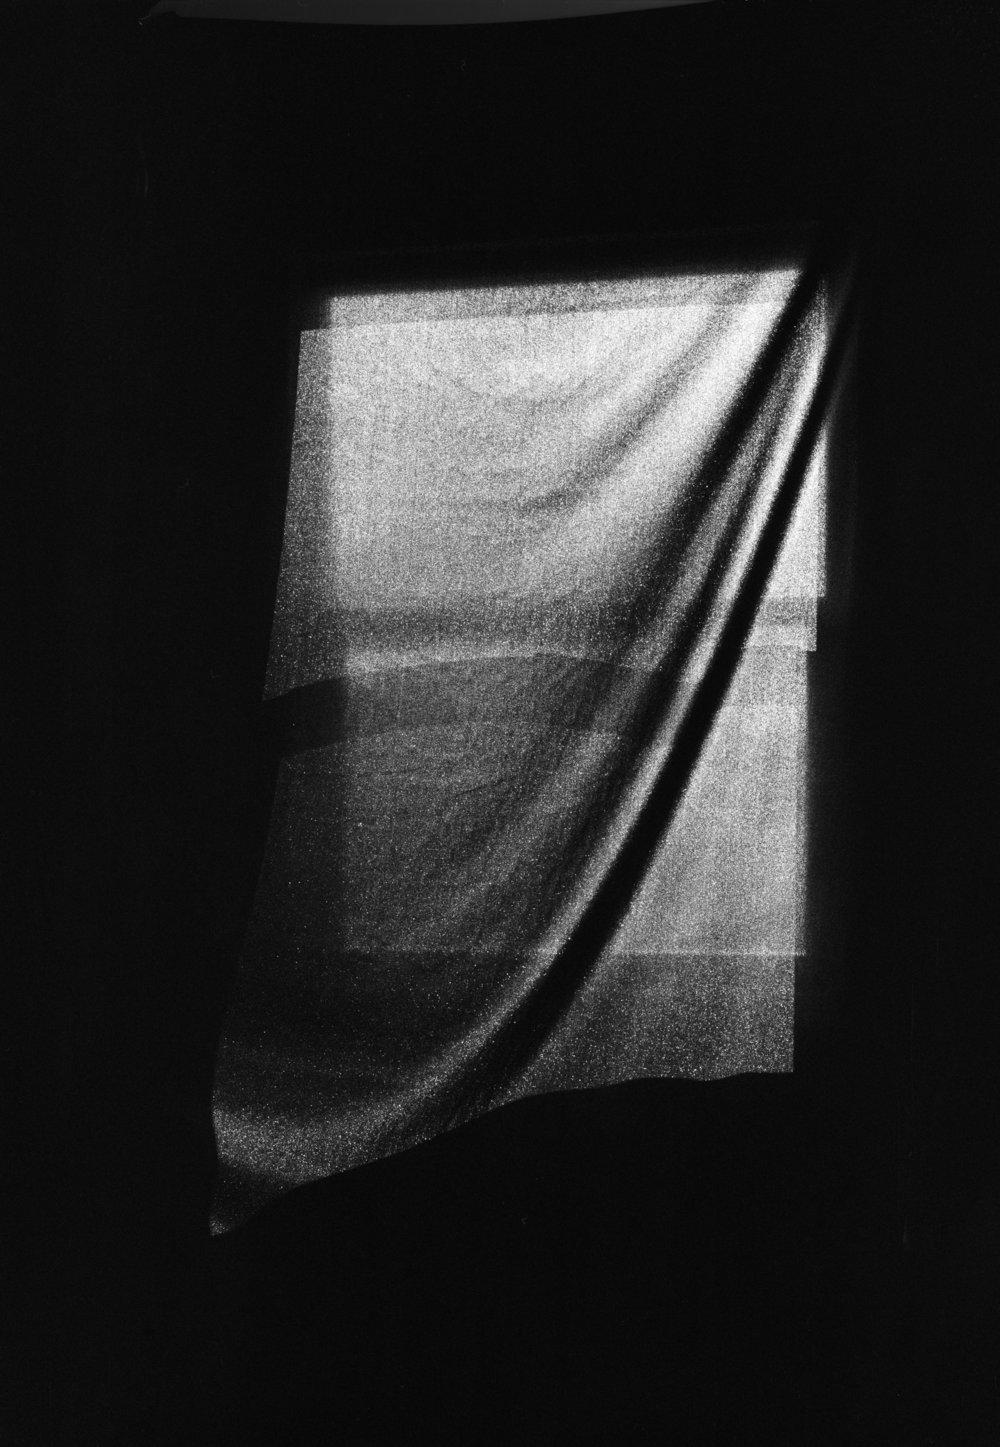 Window Slip , 2013 Archival pigment print 40 x 32 inches   ————